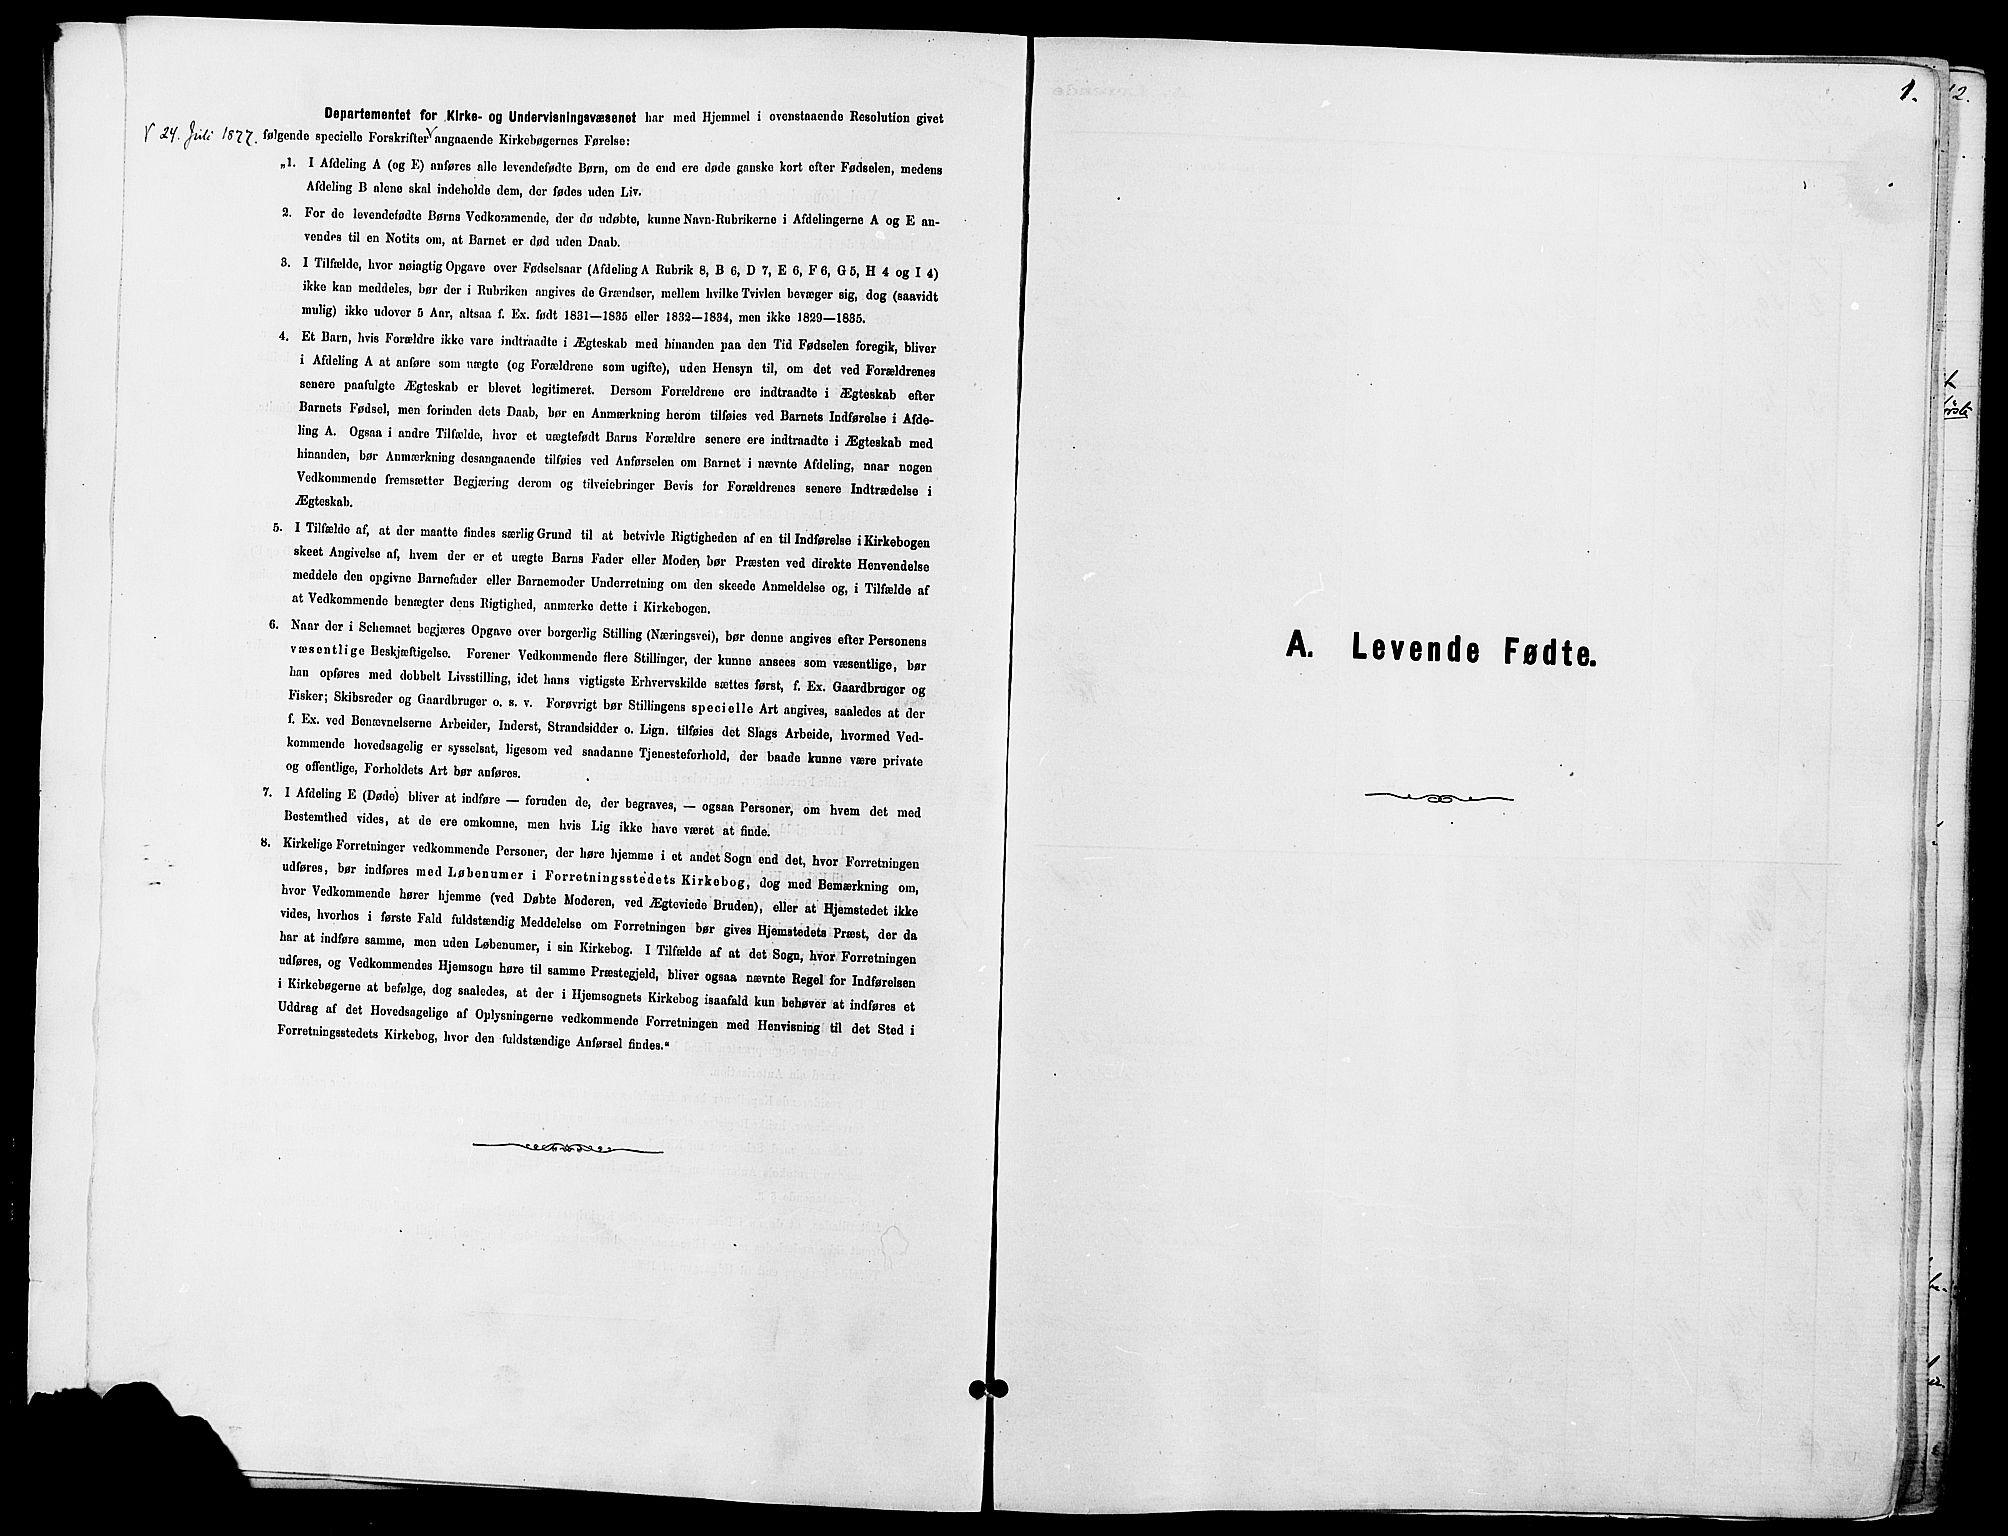 SAH, Dovre prestekontor, Ministerialbok nr. 2, 1879-1890, s. 1